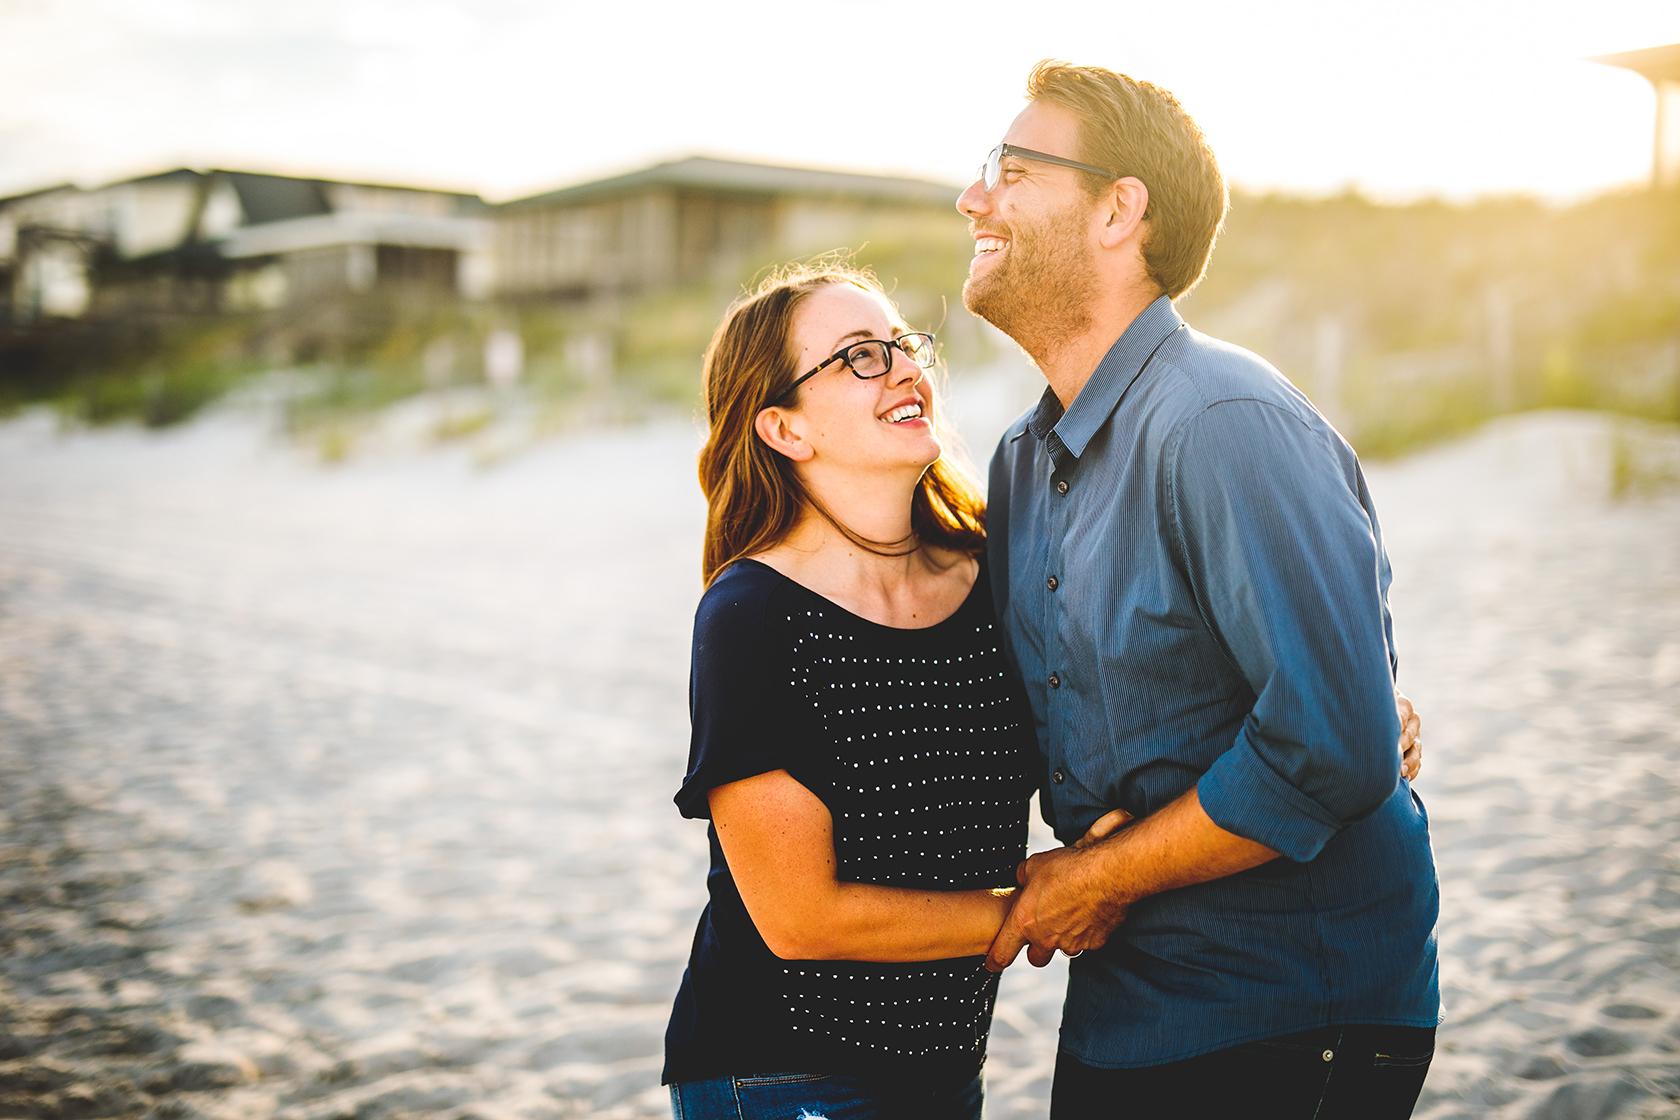 Laughing couple.jpg